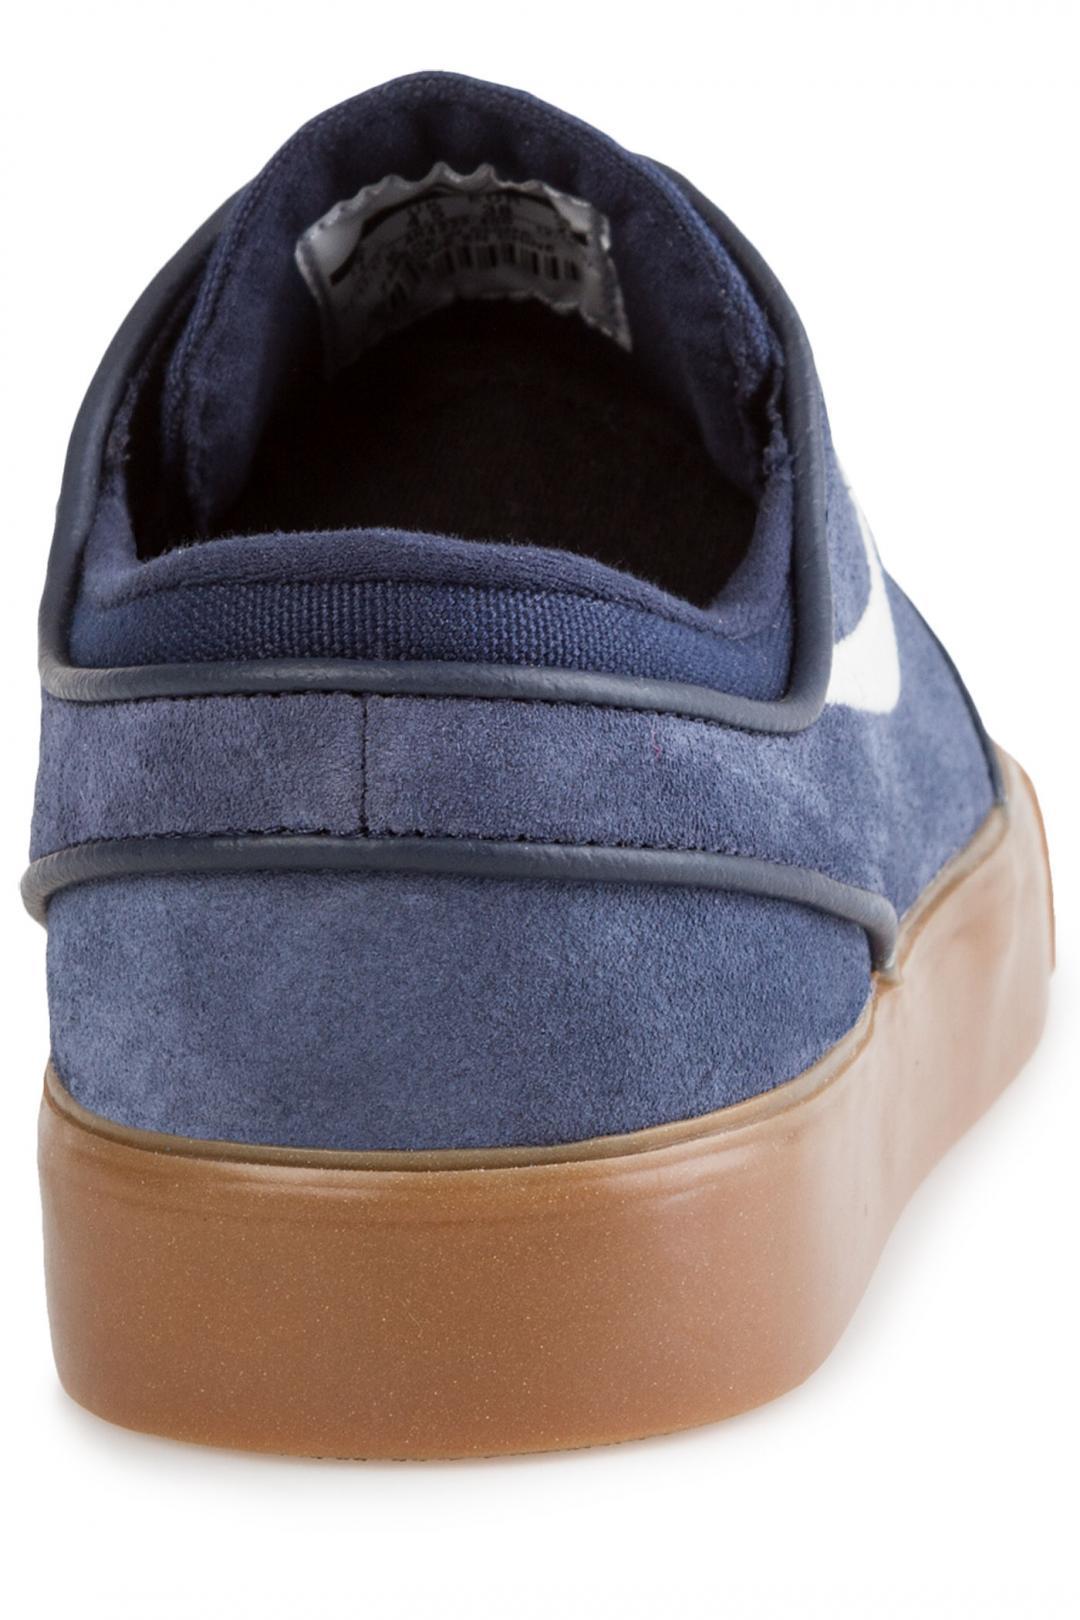 Donna Nike SB Zoom Stefan Janoski obsidian gum med brown   Sneaker